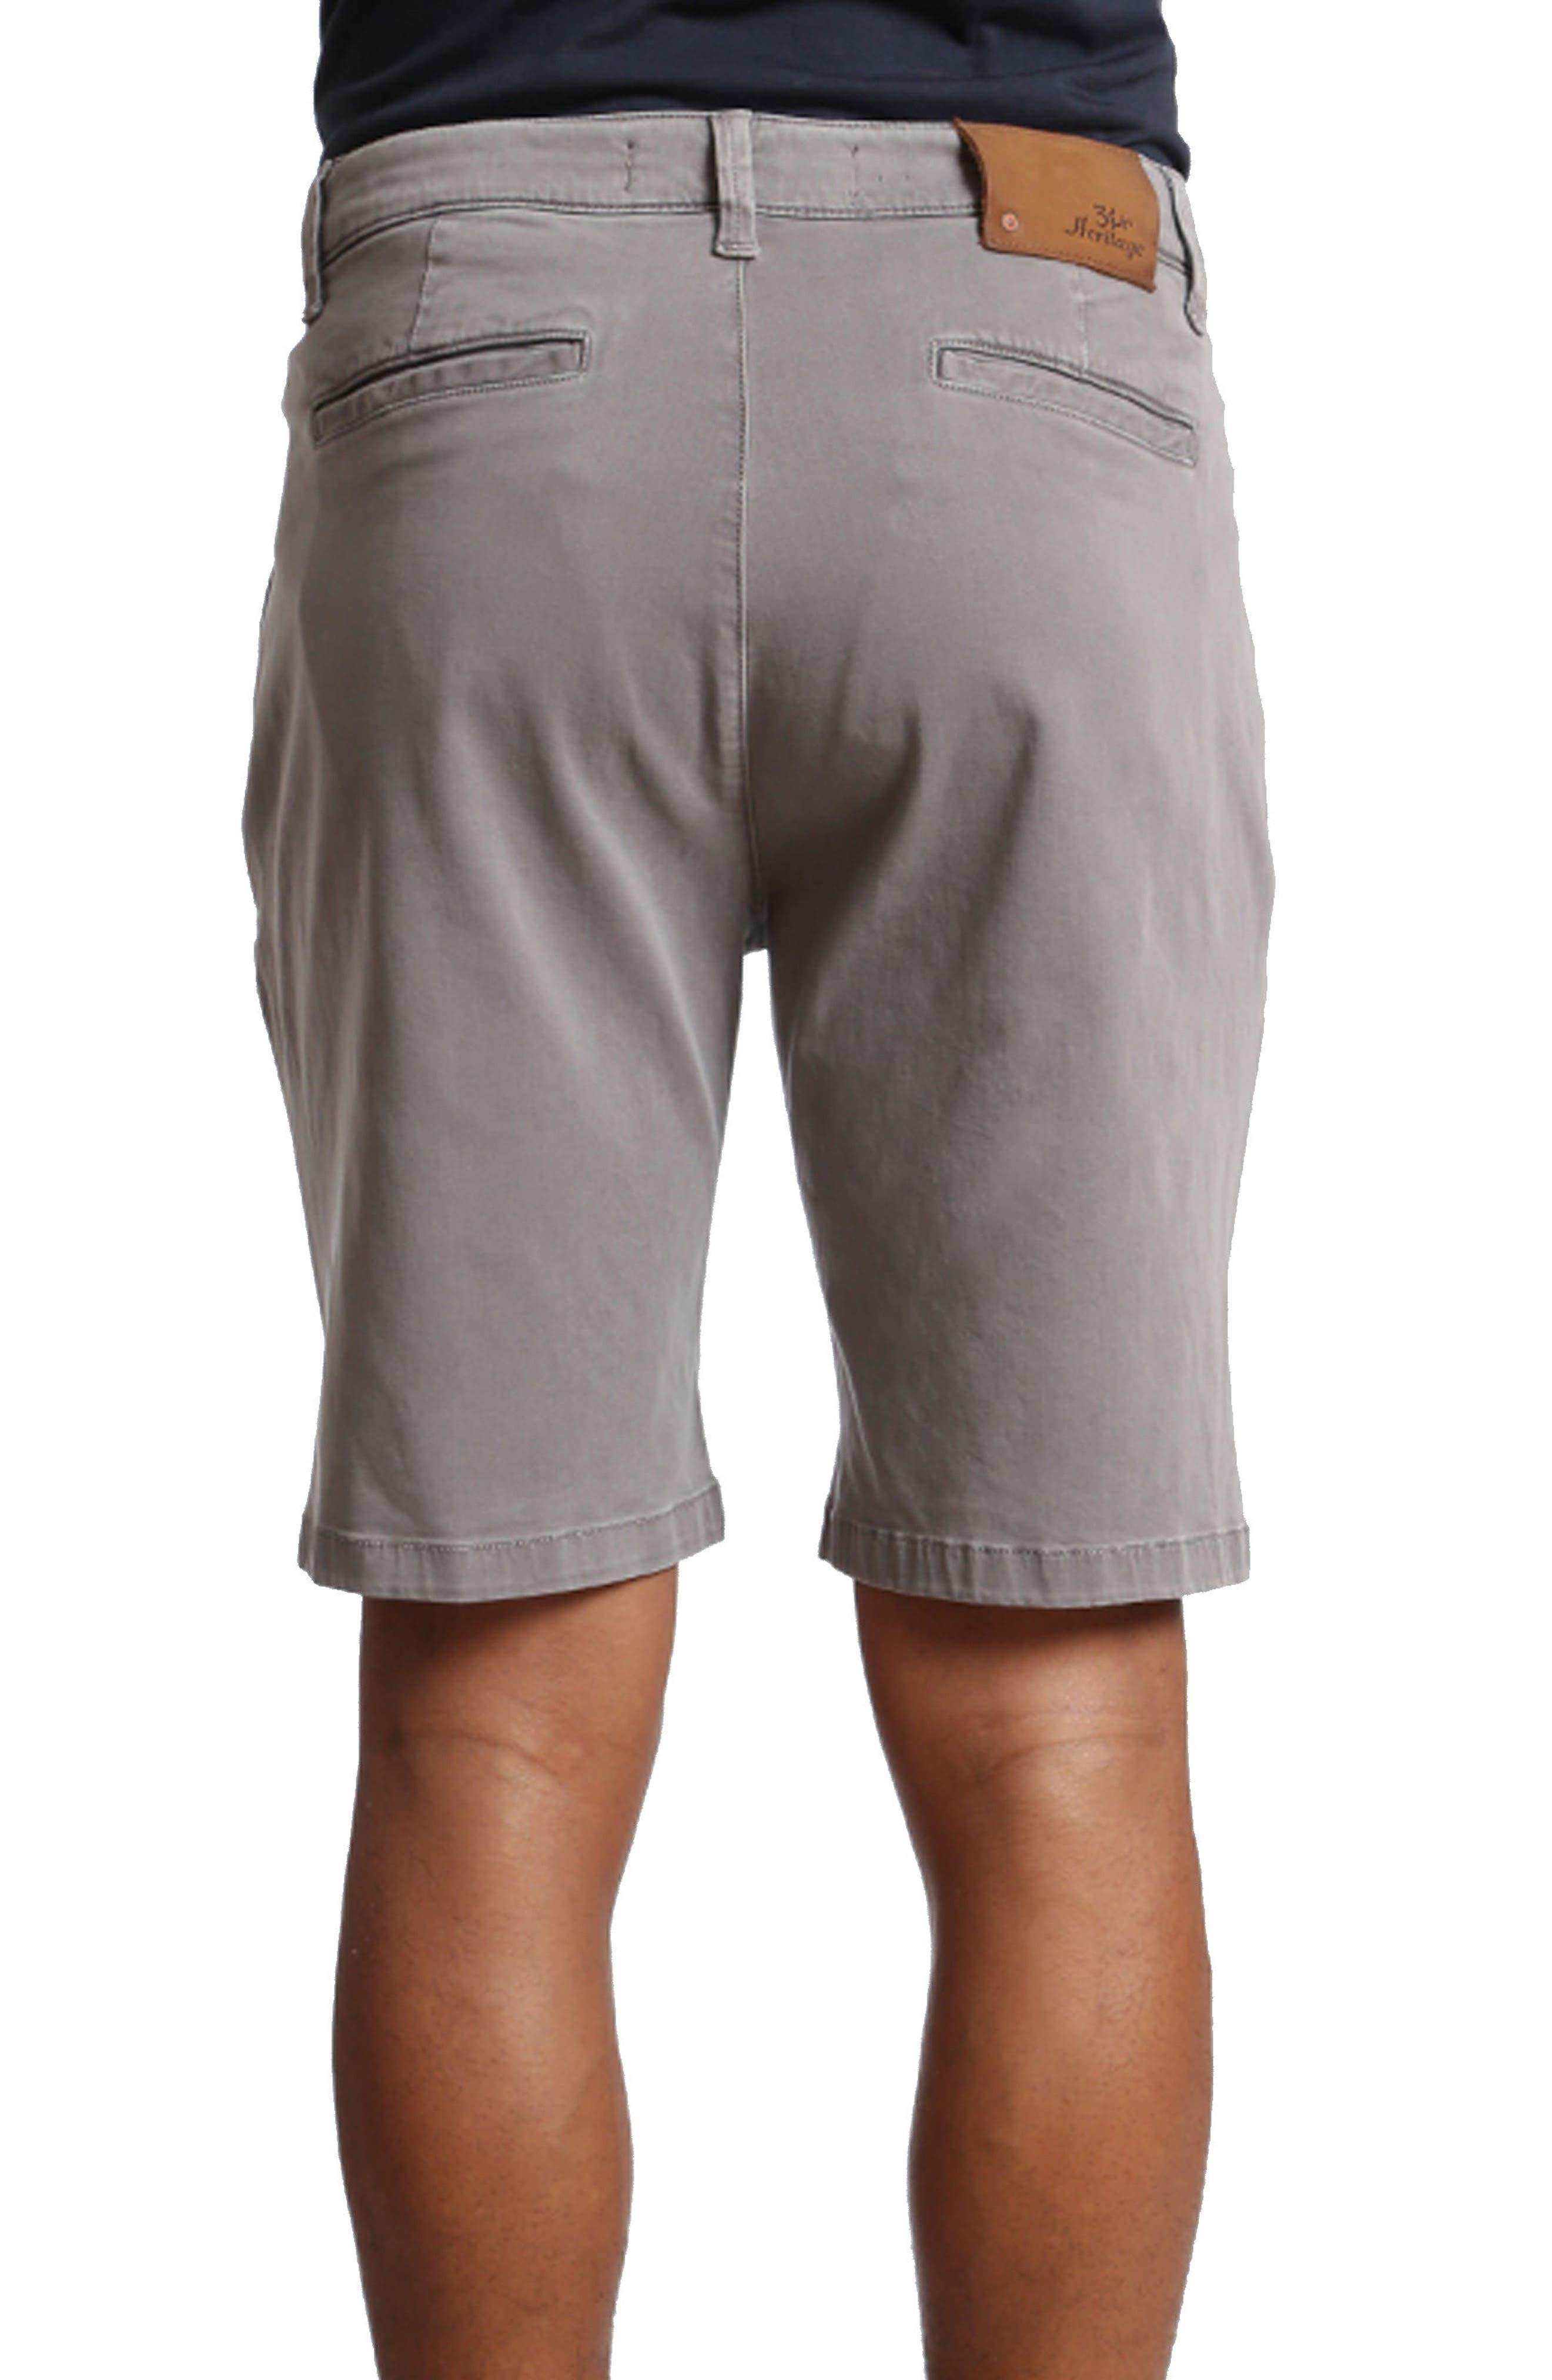 Nevada Twill Shorts,                             Alternate thumbnail 2, color,                             SHARK TWILL